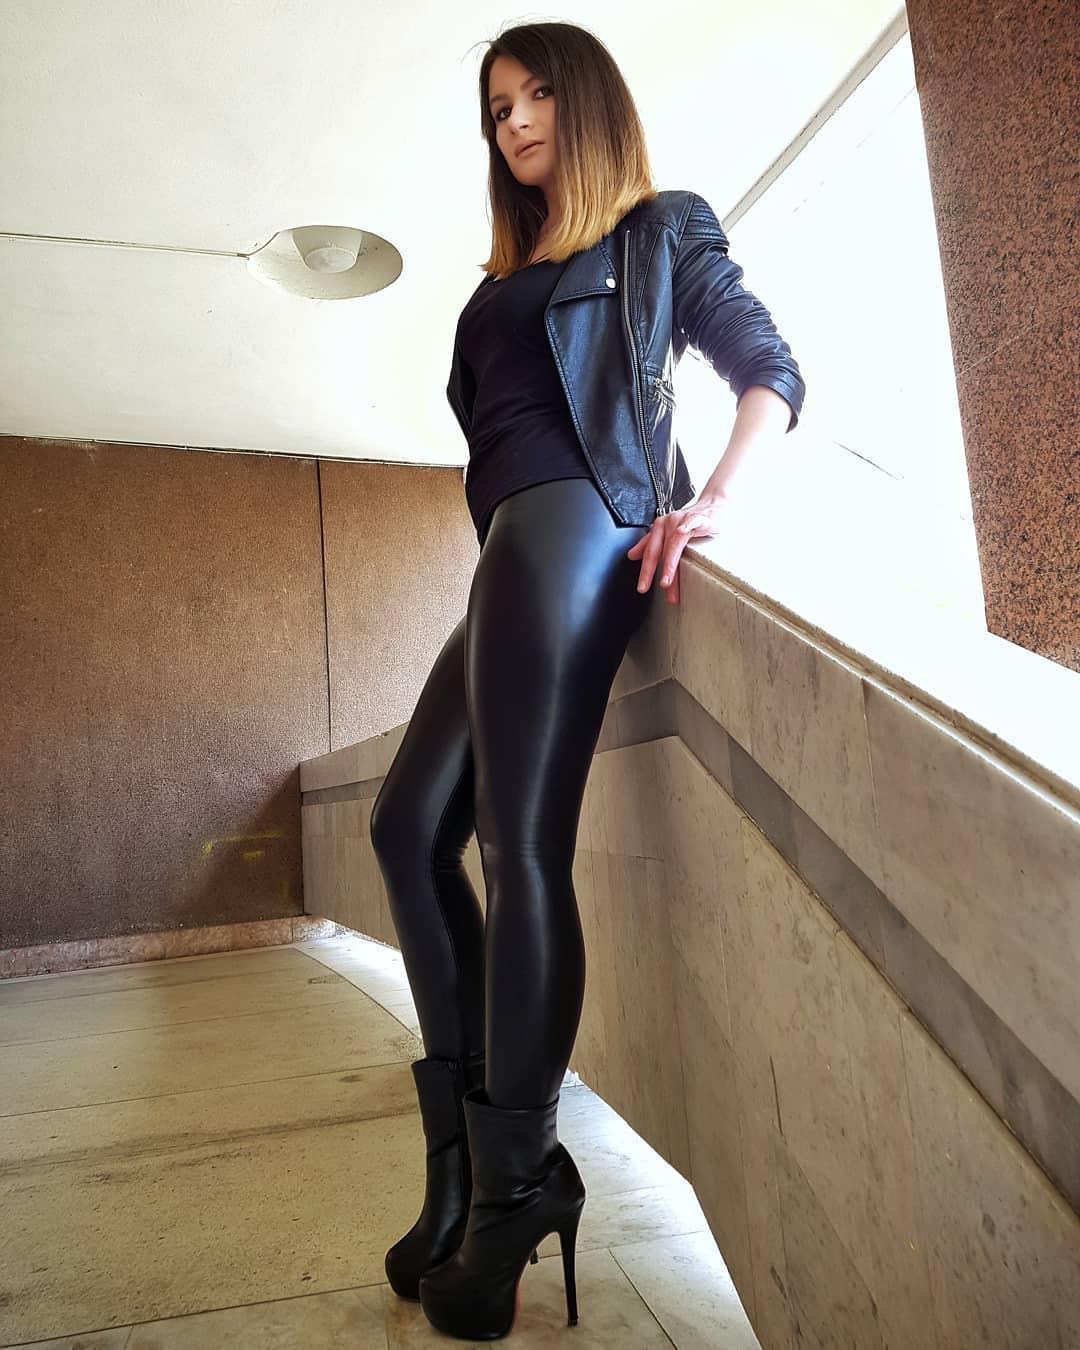 Olga-Madych-Wallpapers-Insta-Fit-Bio-10